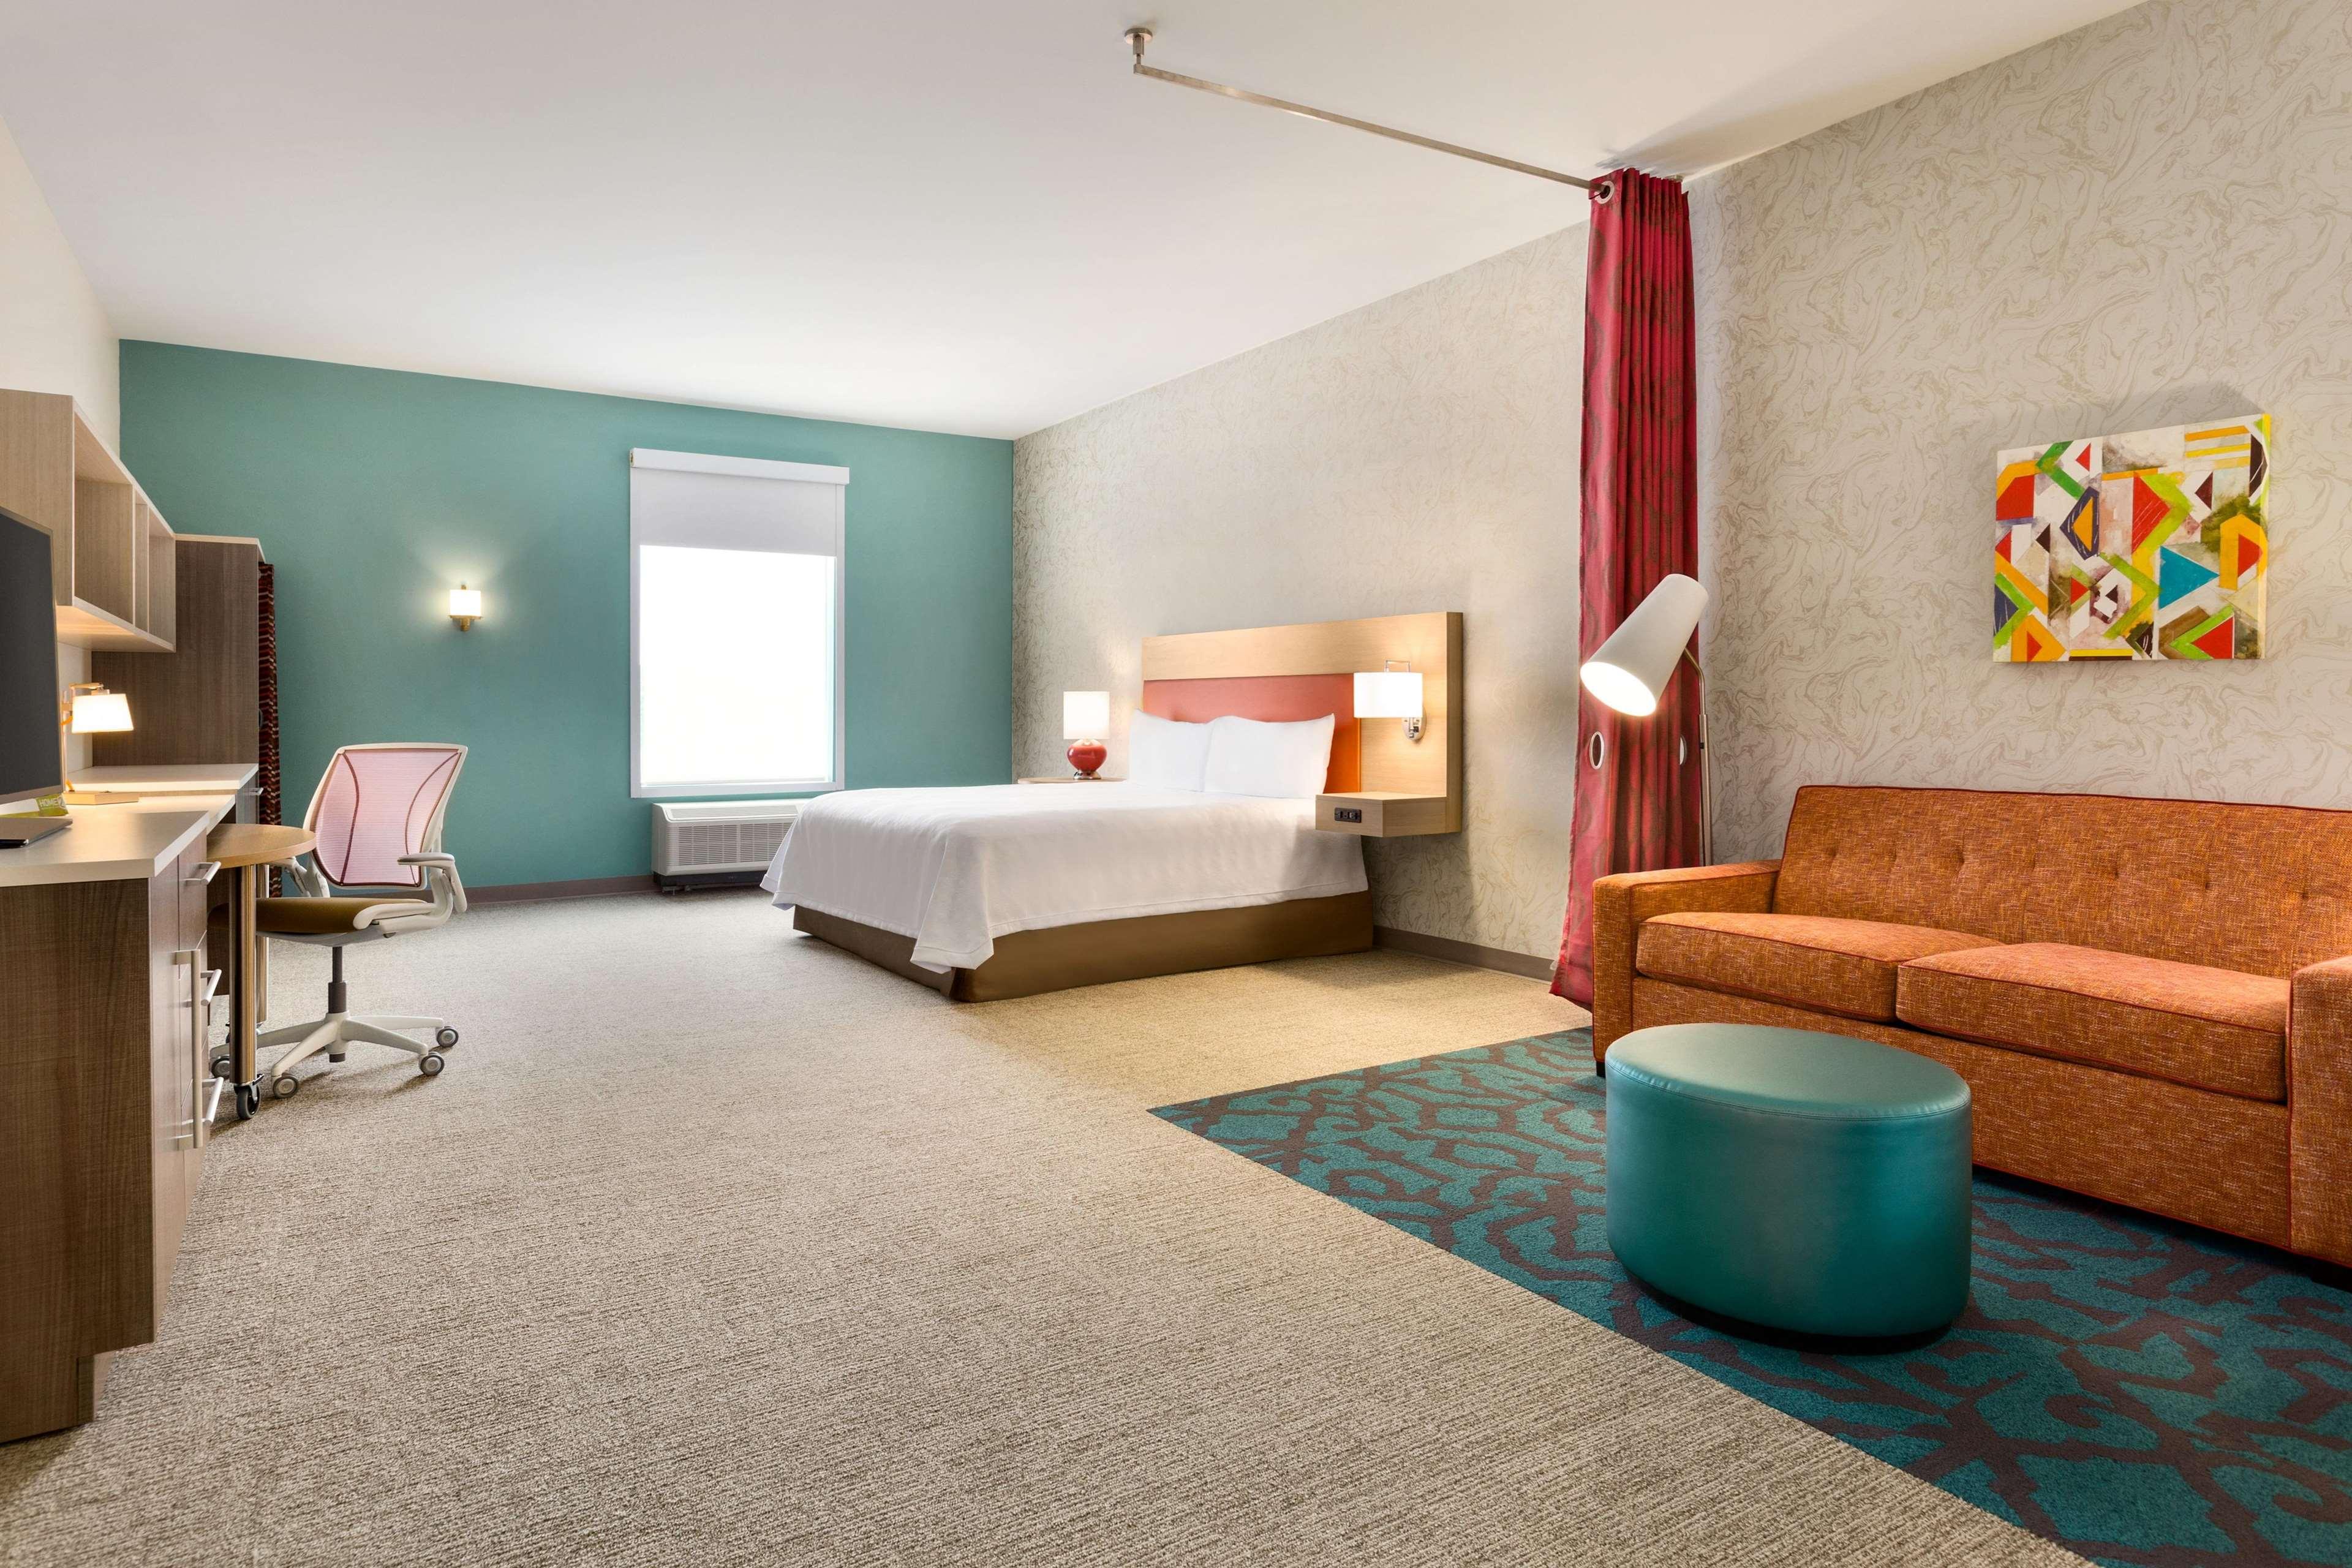 Home2 Suites by Hilton Florence Cincinnati Airport South image 15